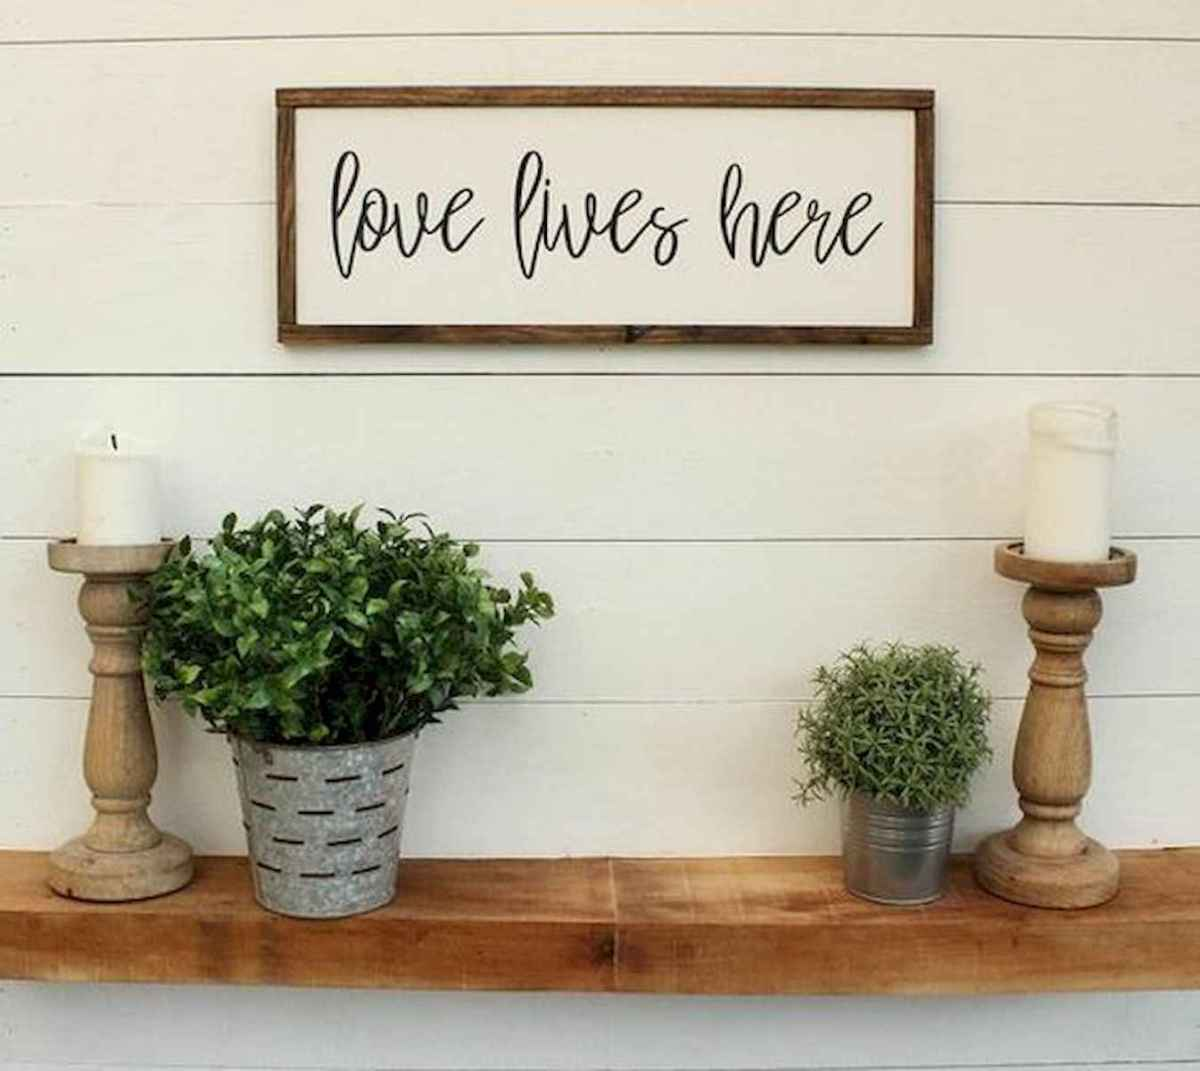 50 Fantastic DIY Home Decor Ideas On A Budget (18)